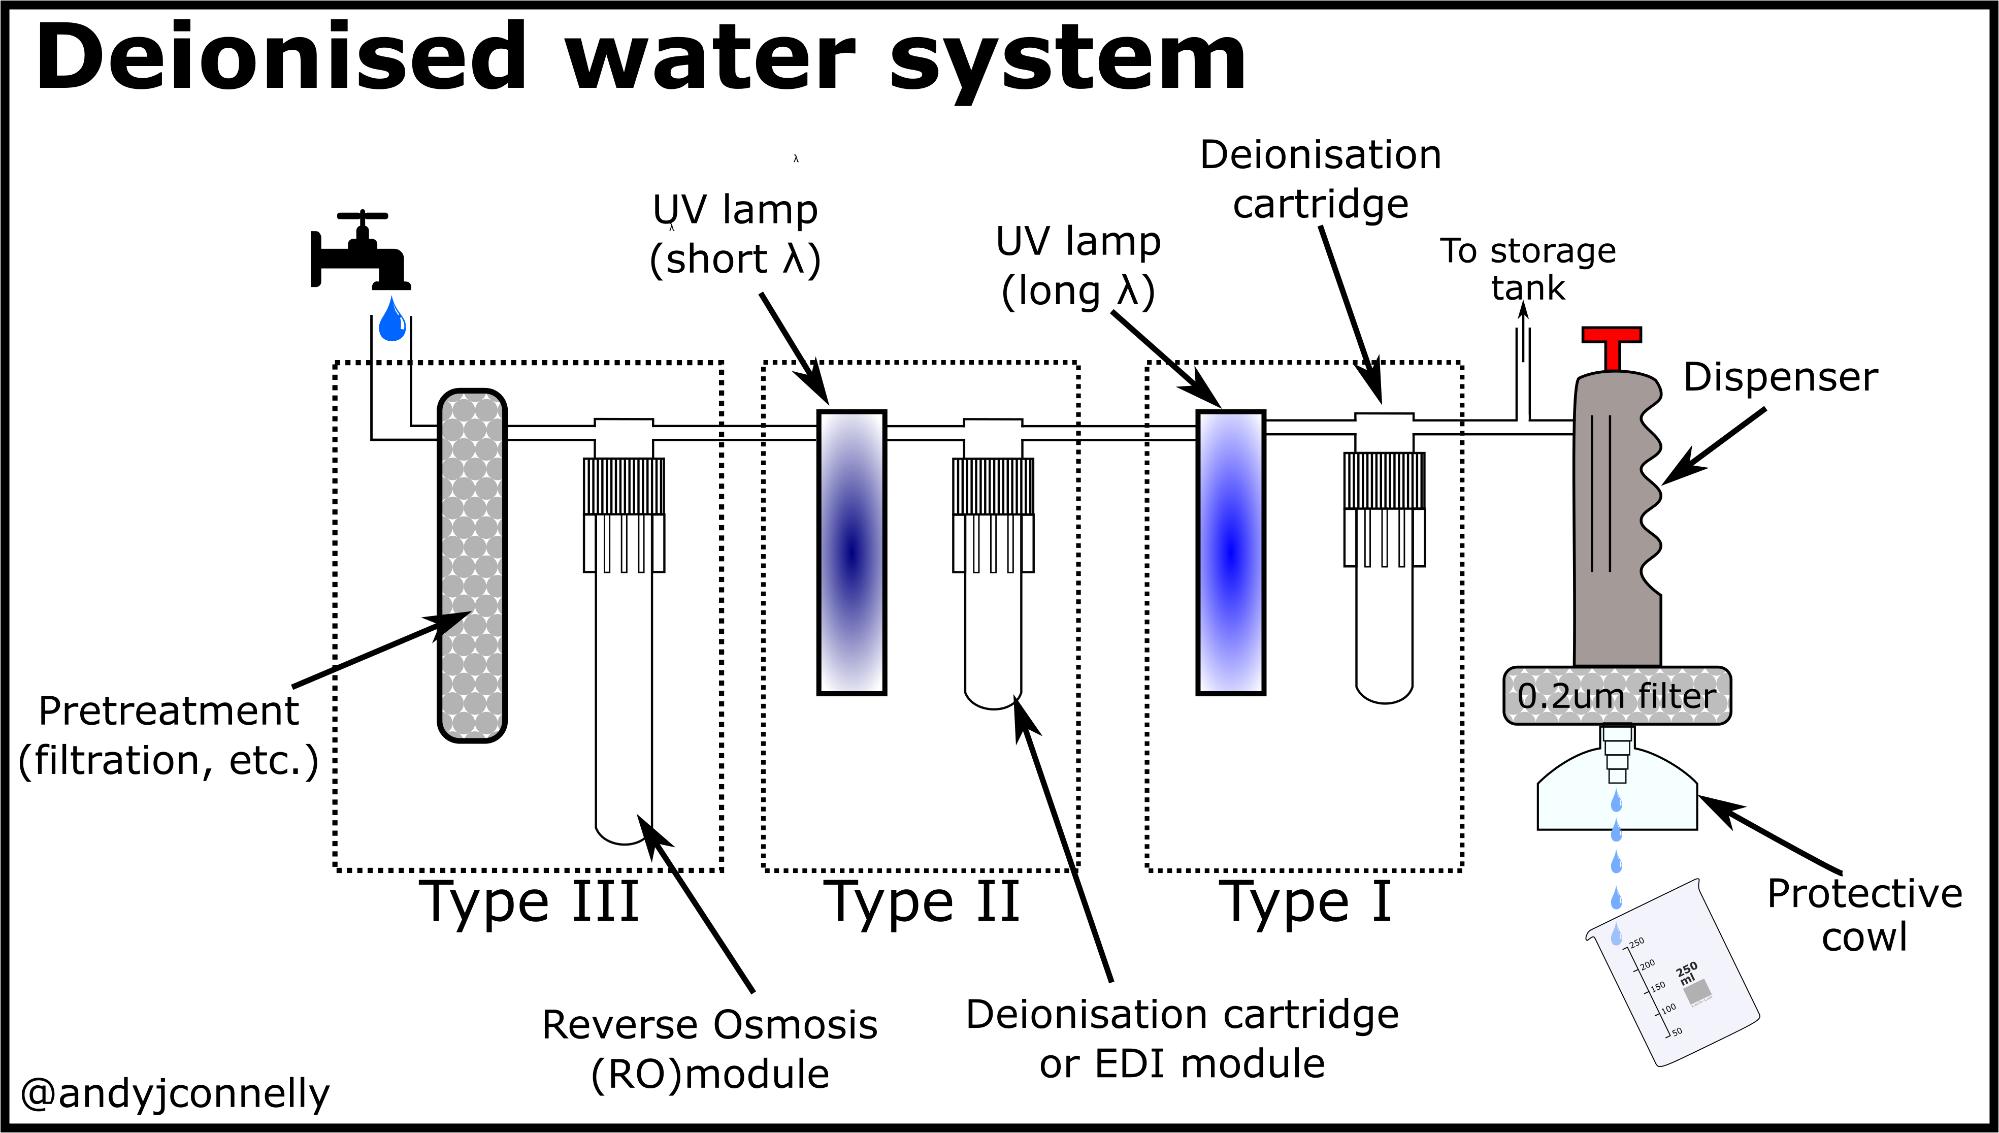 H Th Ng Kh Deionized Water La Gi